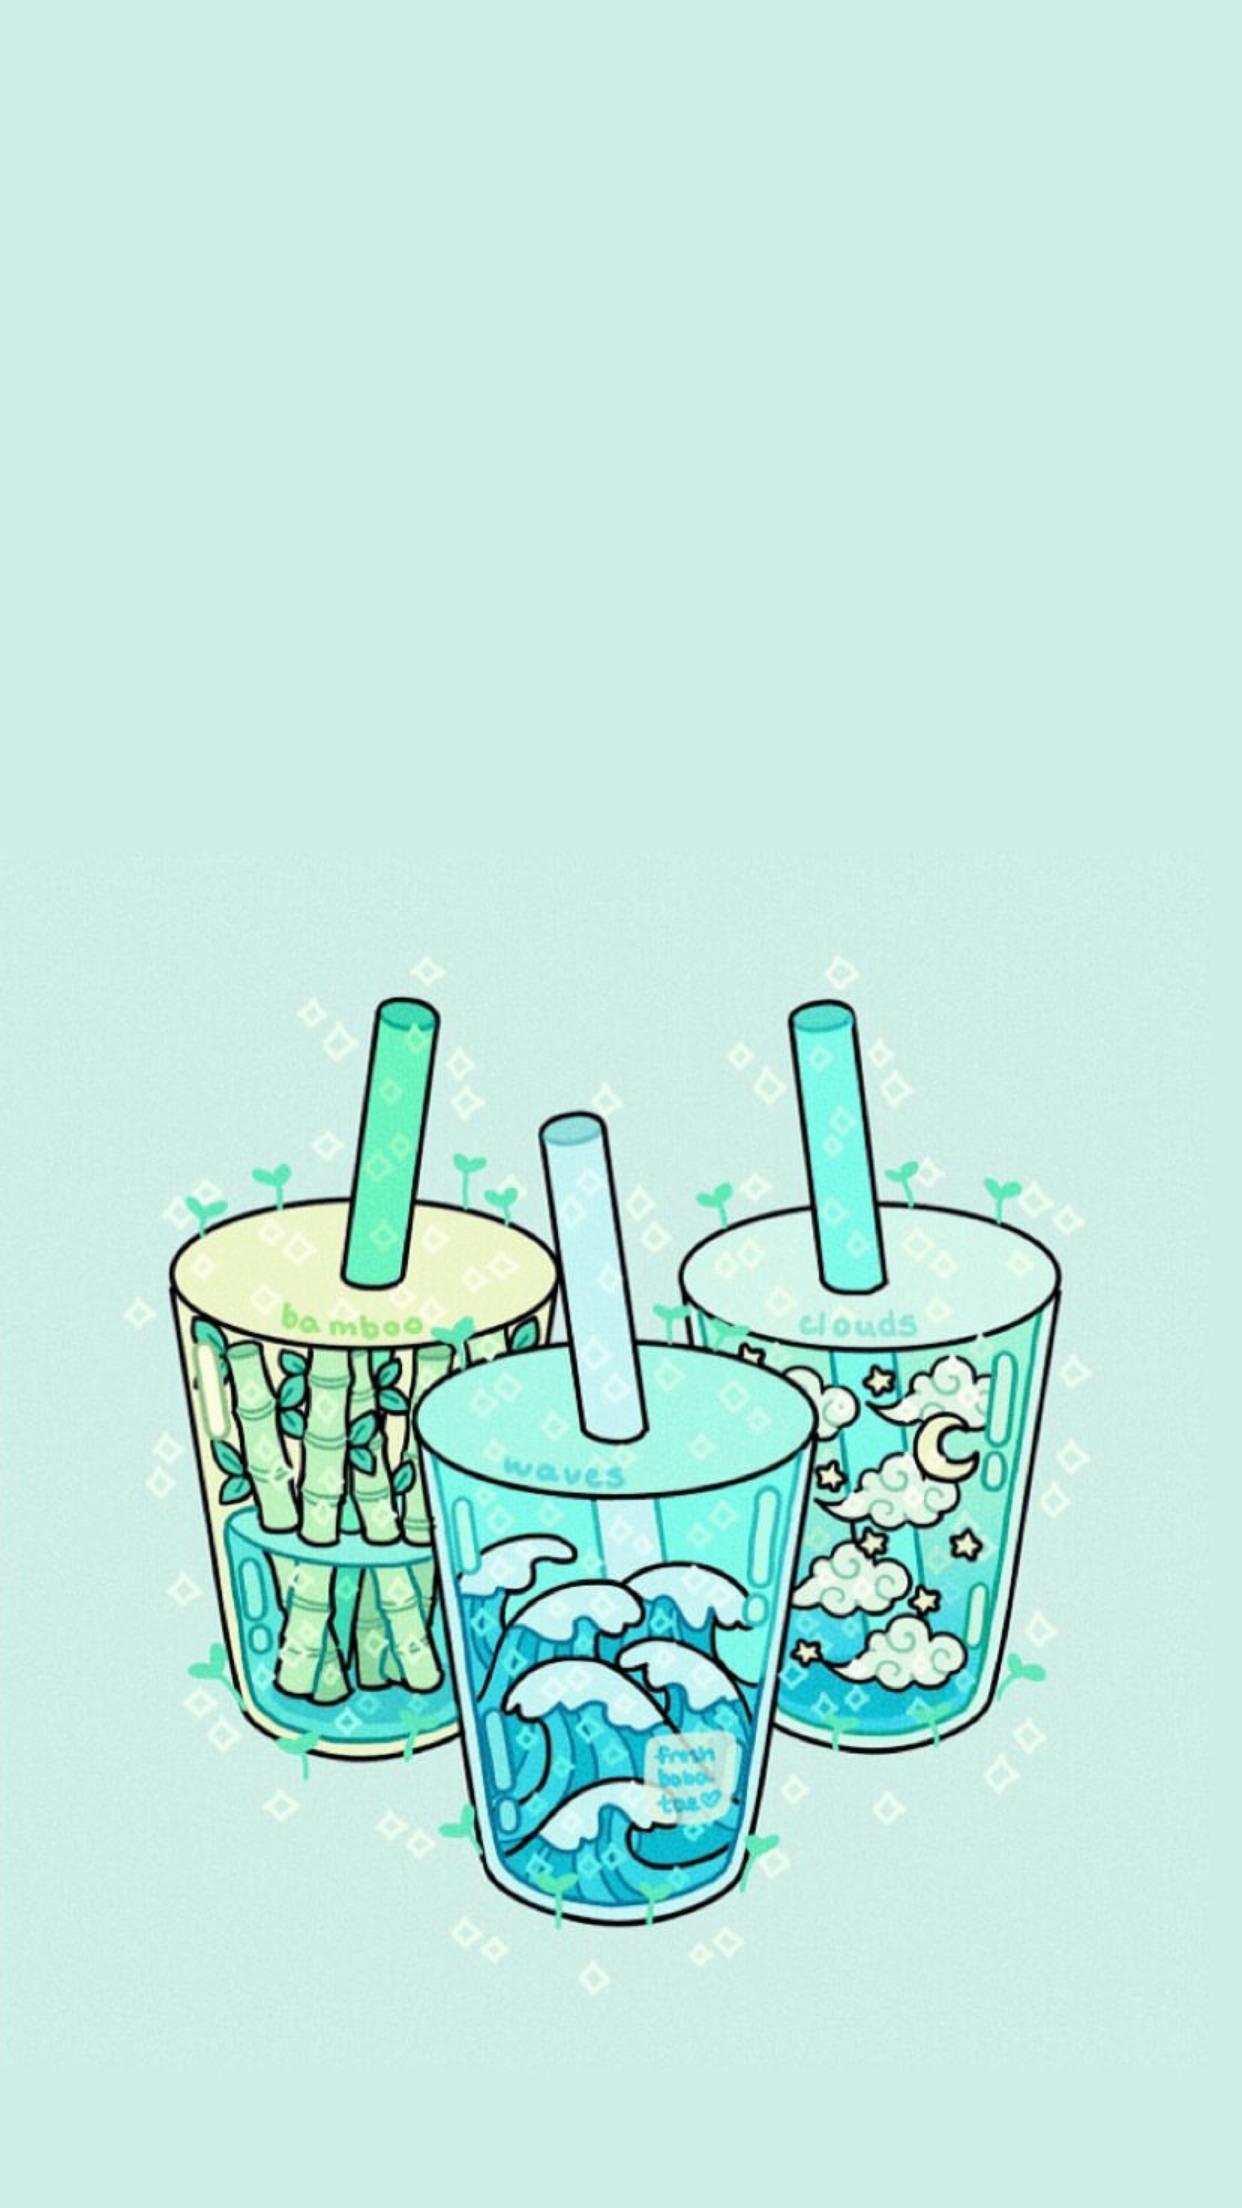 Drawing In 2020 Cute Pastel Wallpaper Wallpaper Iphone Cute Cute Wallpaper Backgrounds